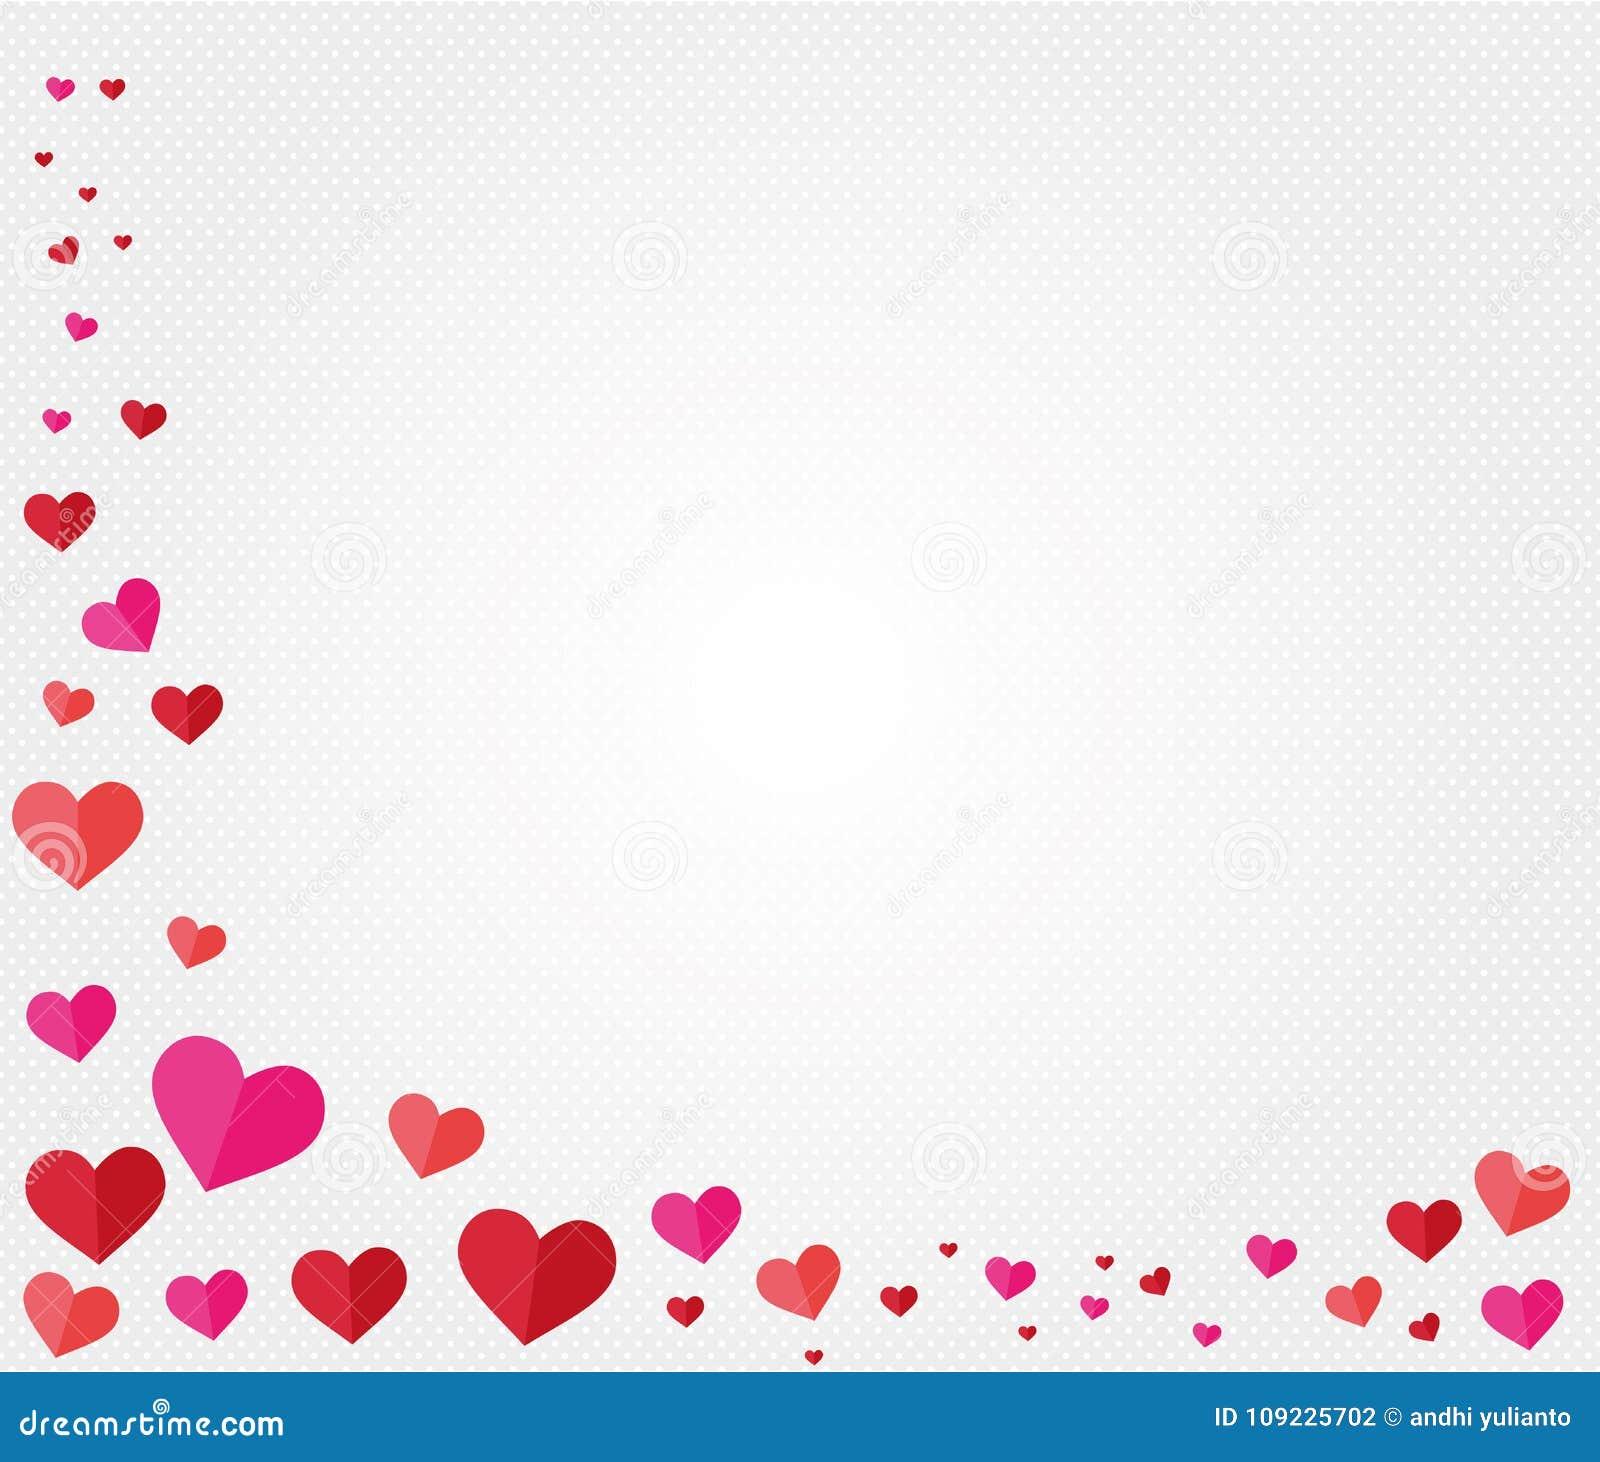 Valentine Heart Shape Theme Background Design Stock Vector